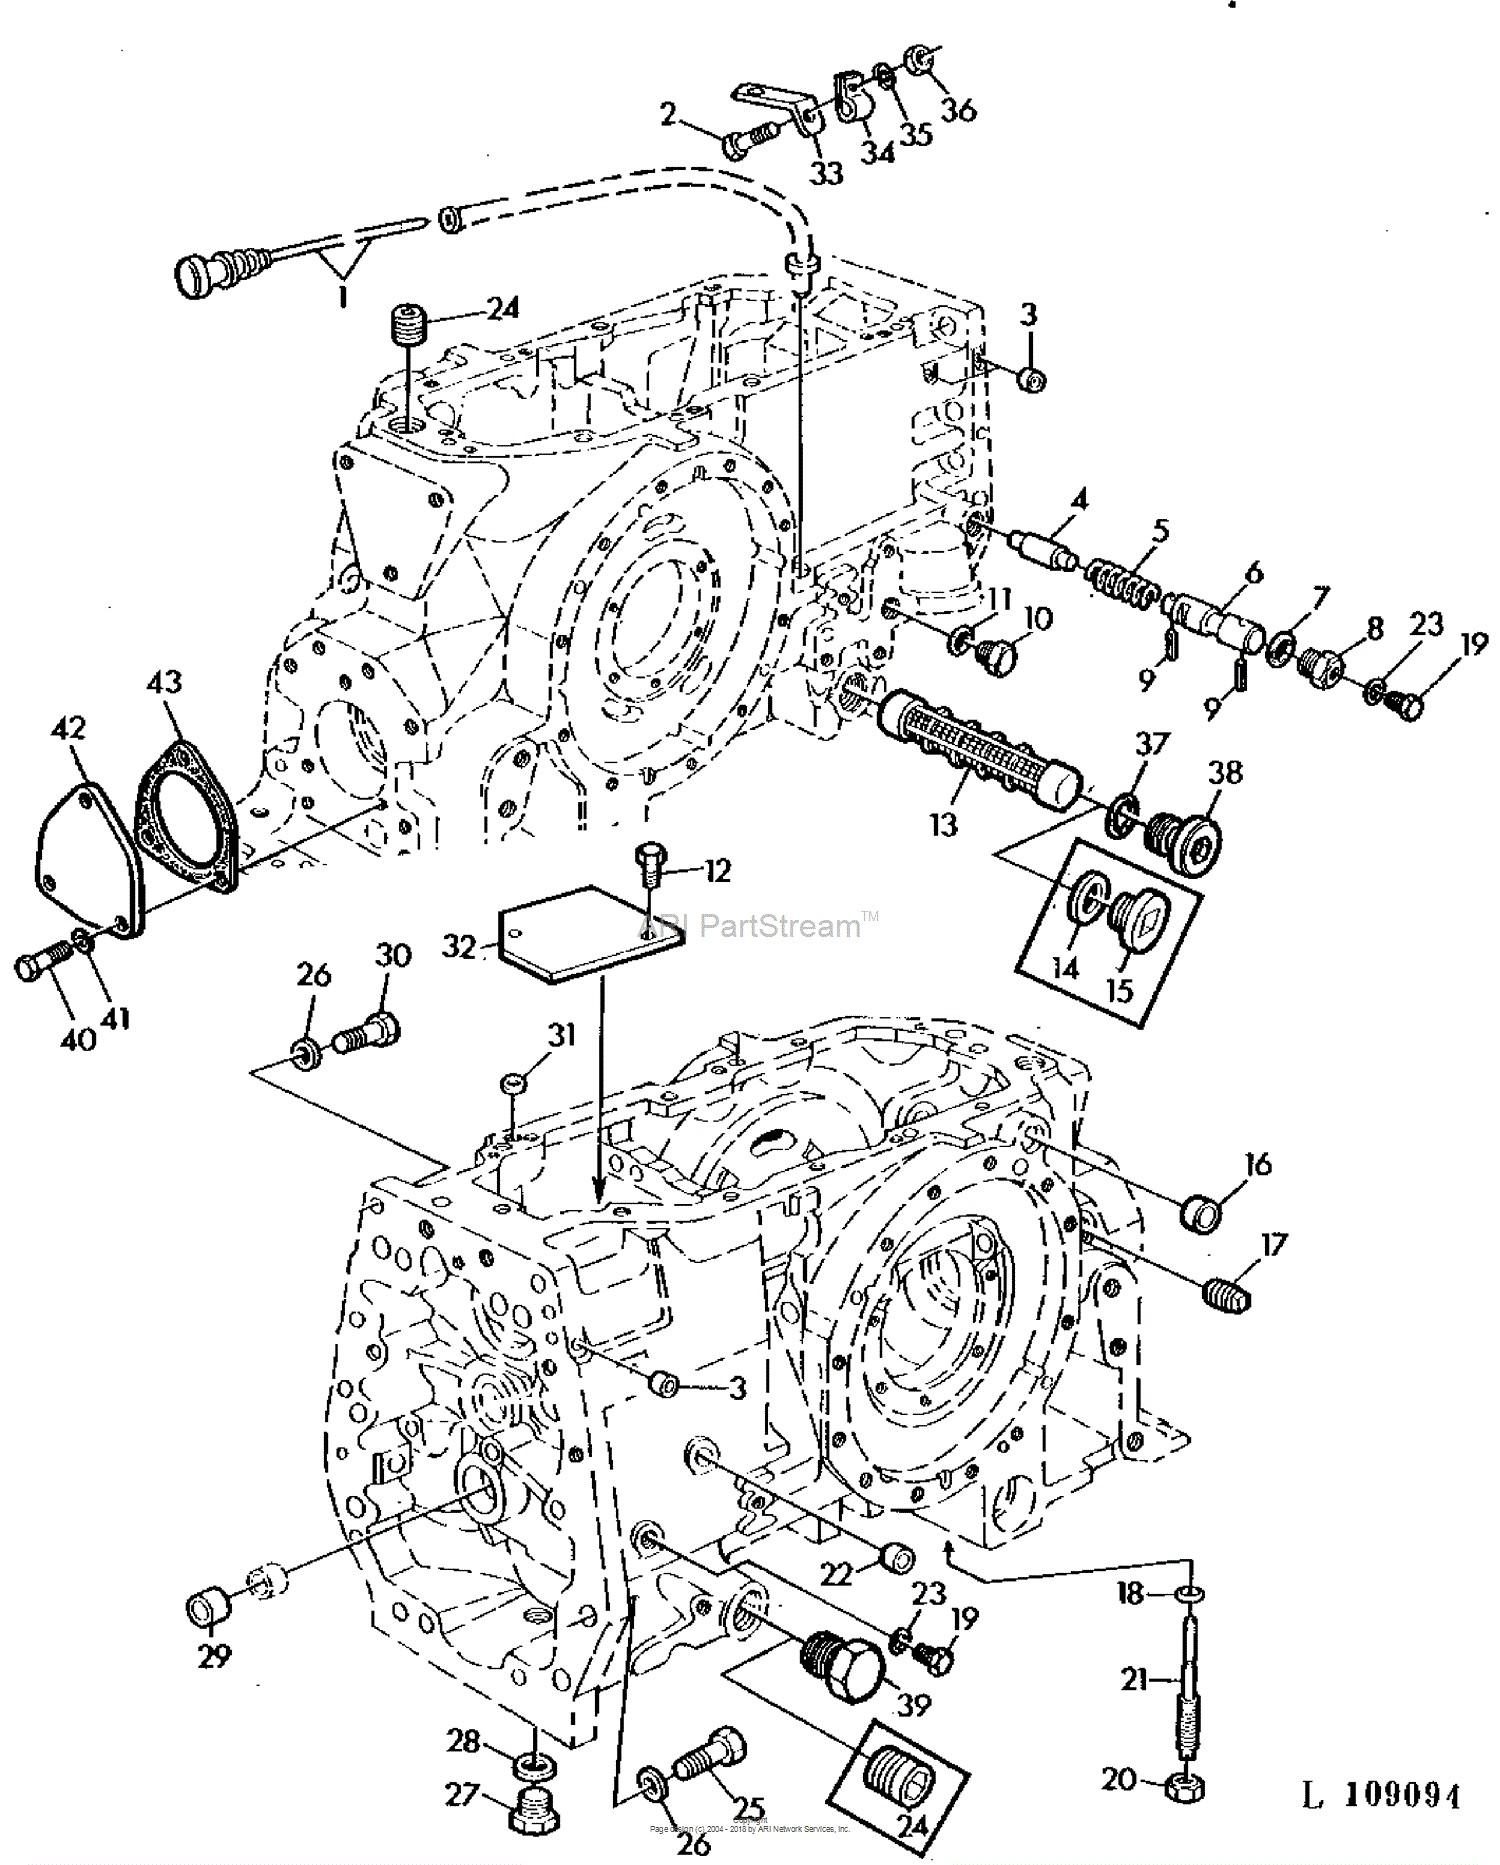 John Deere 2 Cylinder Engine Diagram John Deere Parts Diagrams John Deere 2150 Tractor Pc4182 Of John Deere 2 Cylinder Engine Diagram